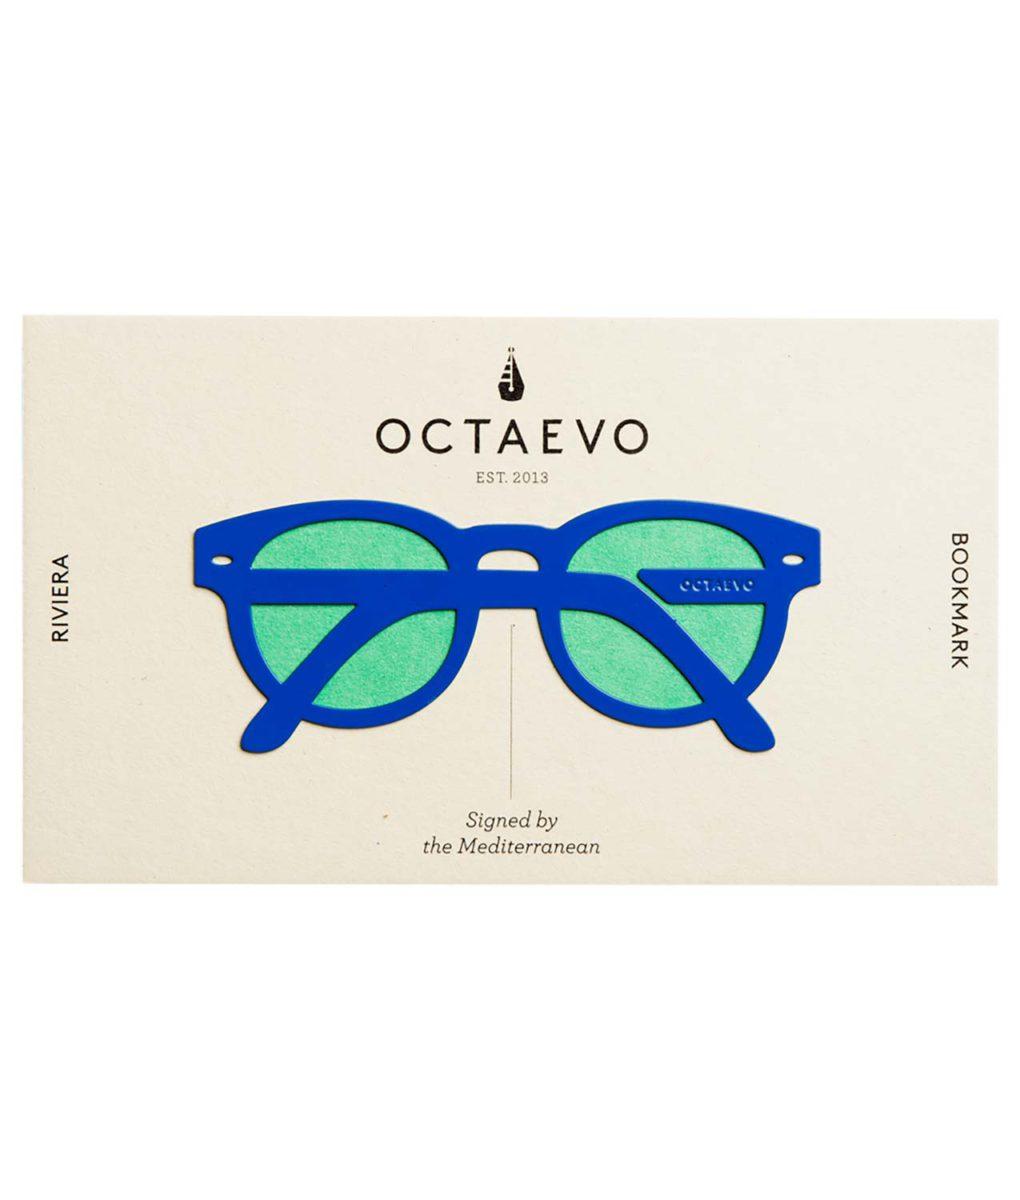 azul-bookmark-riviera-octaevo